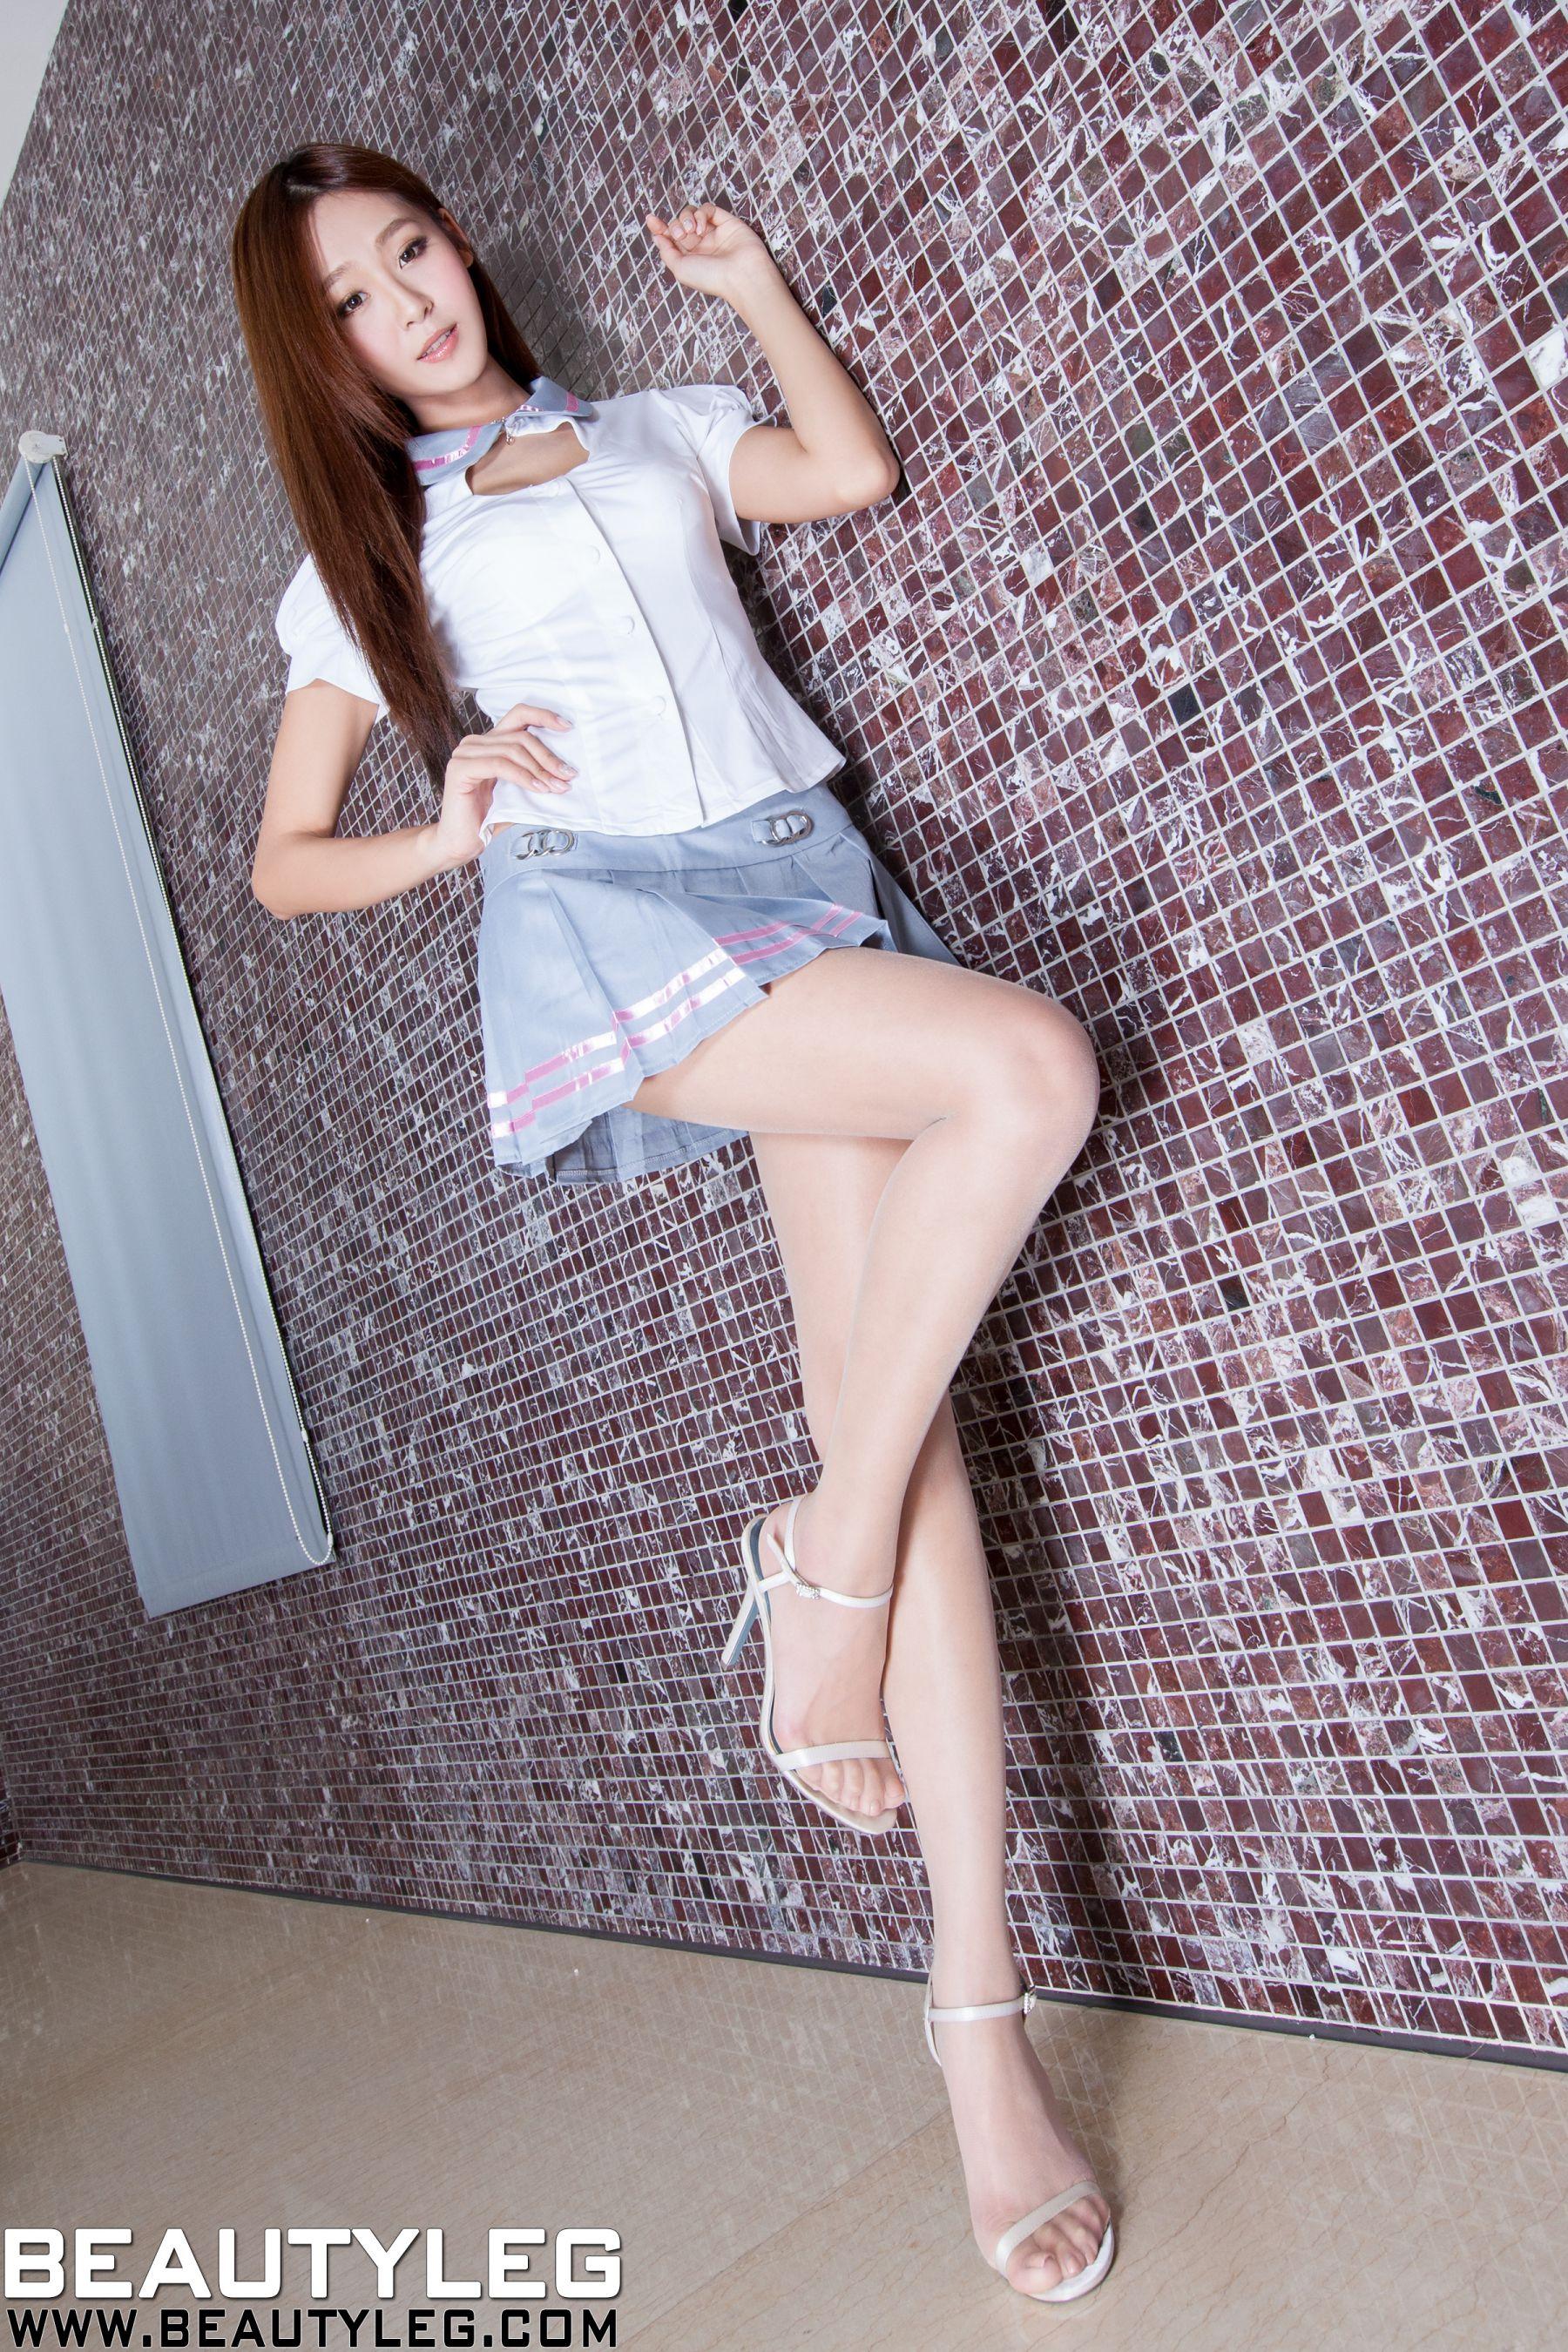 VOL.1436 [Beautyleg]校服美腿:Winnie小雪(庄咏惠,庄温妮,腿模Winnie)高品质写真套图(53P)